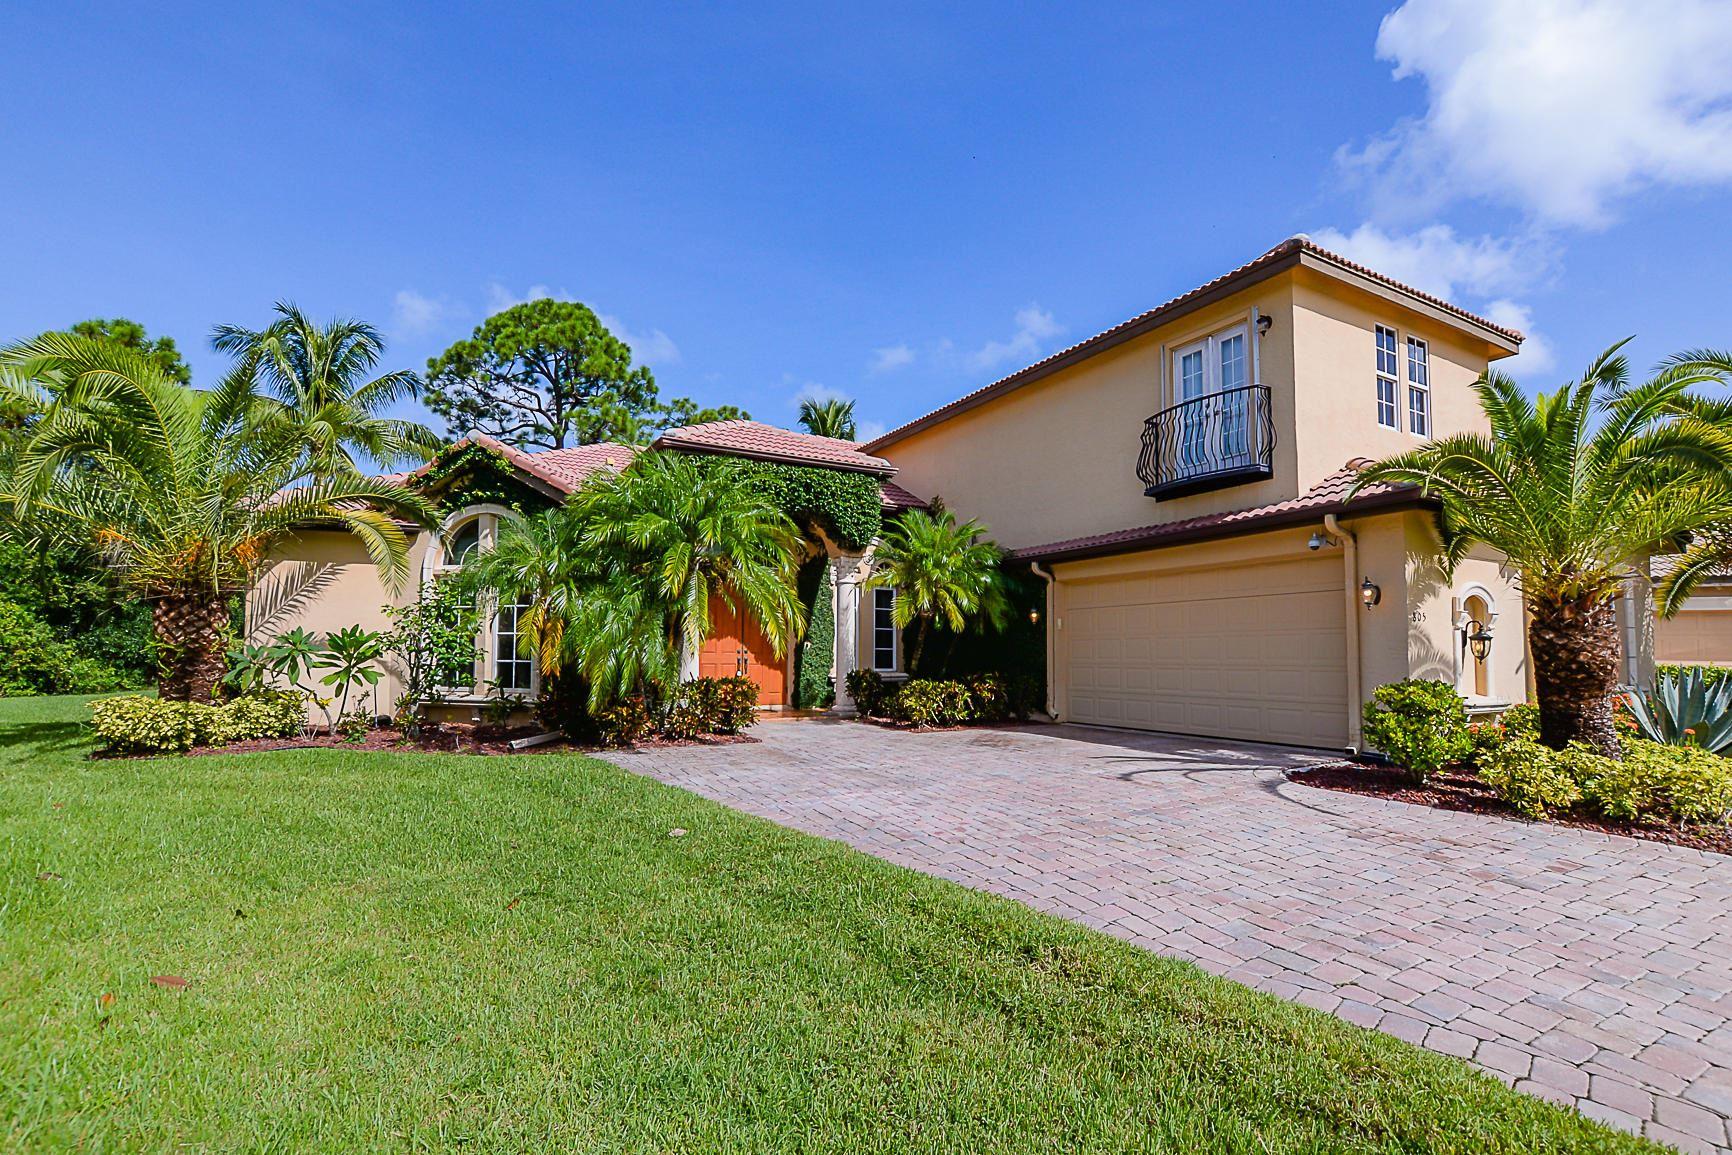 Photo of 805 SW Classico Court, Port Saint Lucie, FL 34986 (MLS # RX-10650705)